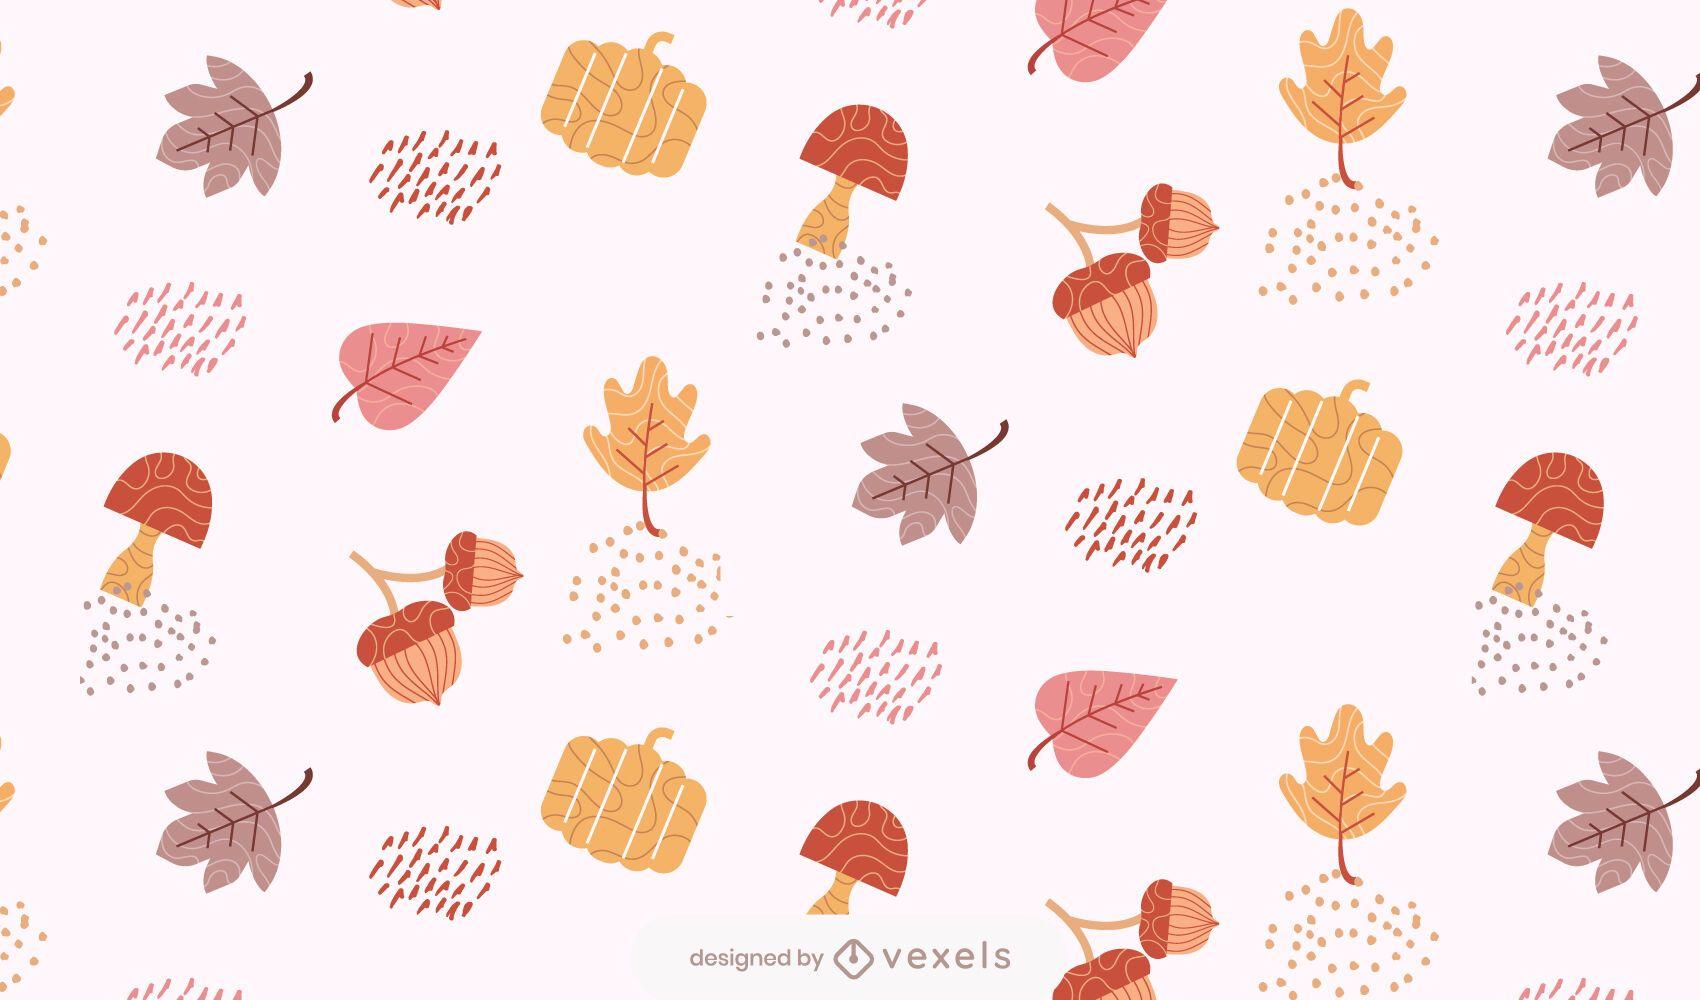 autumn leaves pattern design